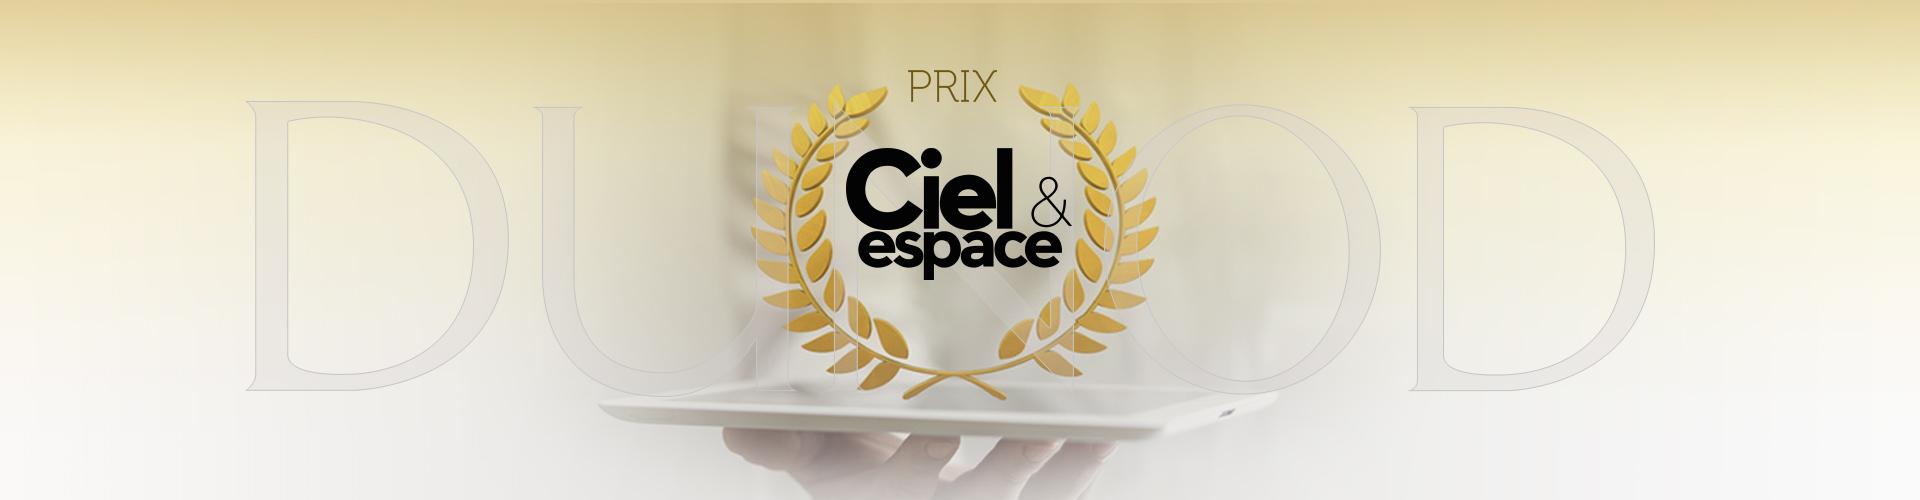 actu-prix-cieletespace-1920x500.jpg